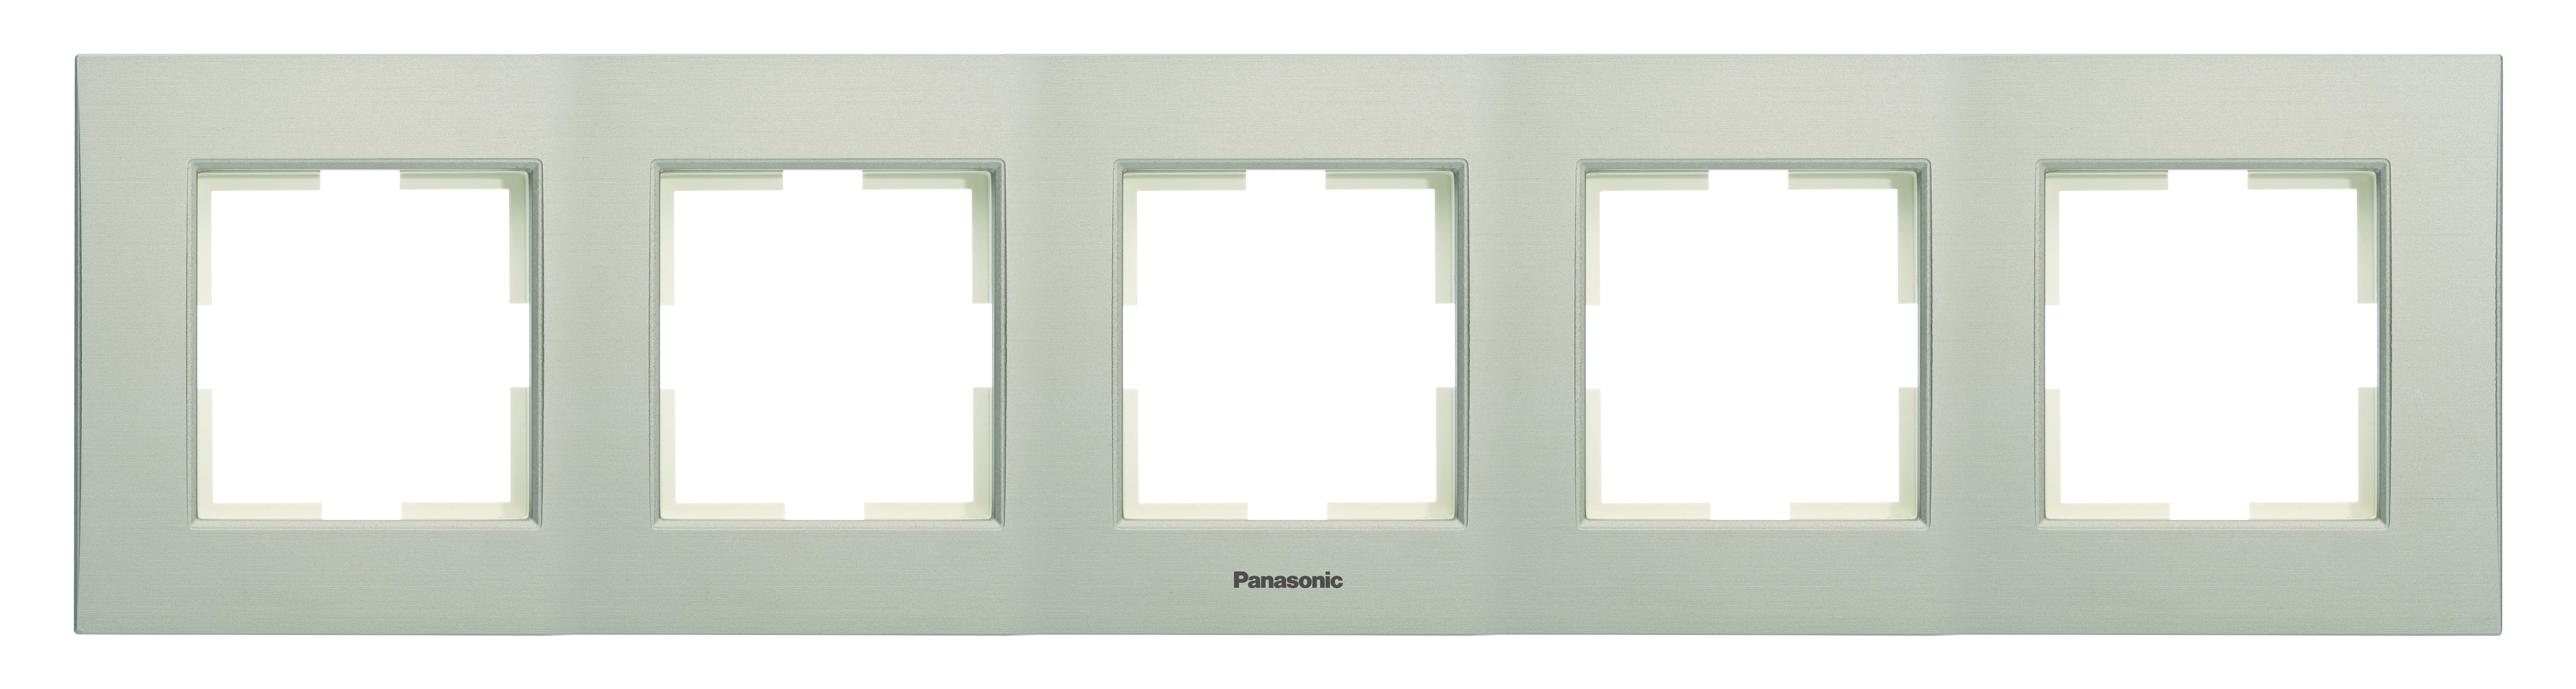 Рамка Panasonic Wktf0814-2dg-res karre plus dg рамка для фото jardo